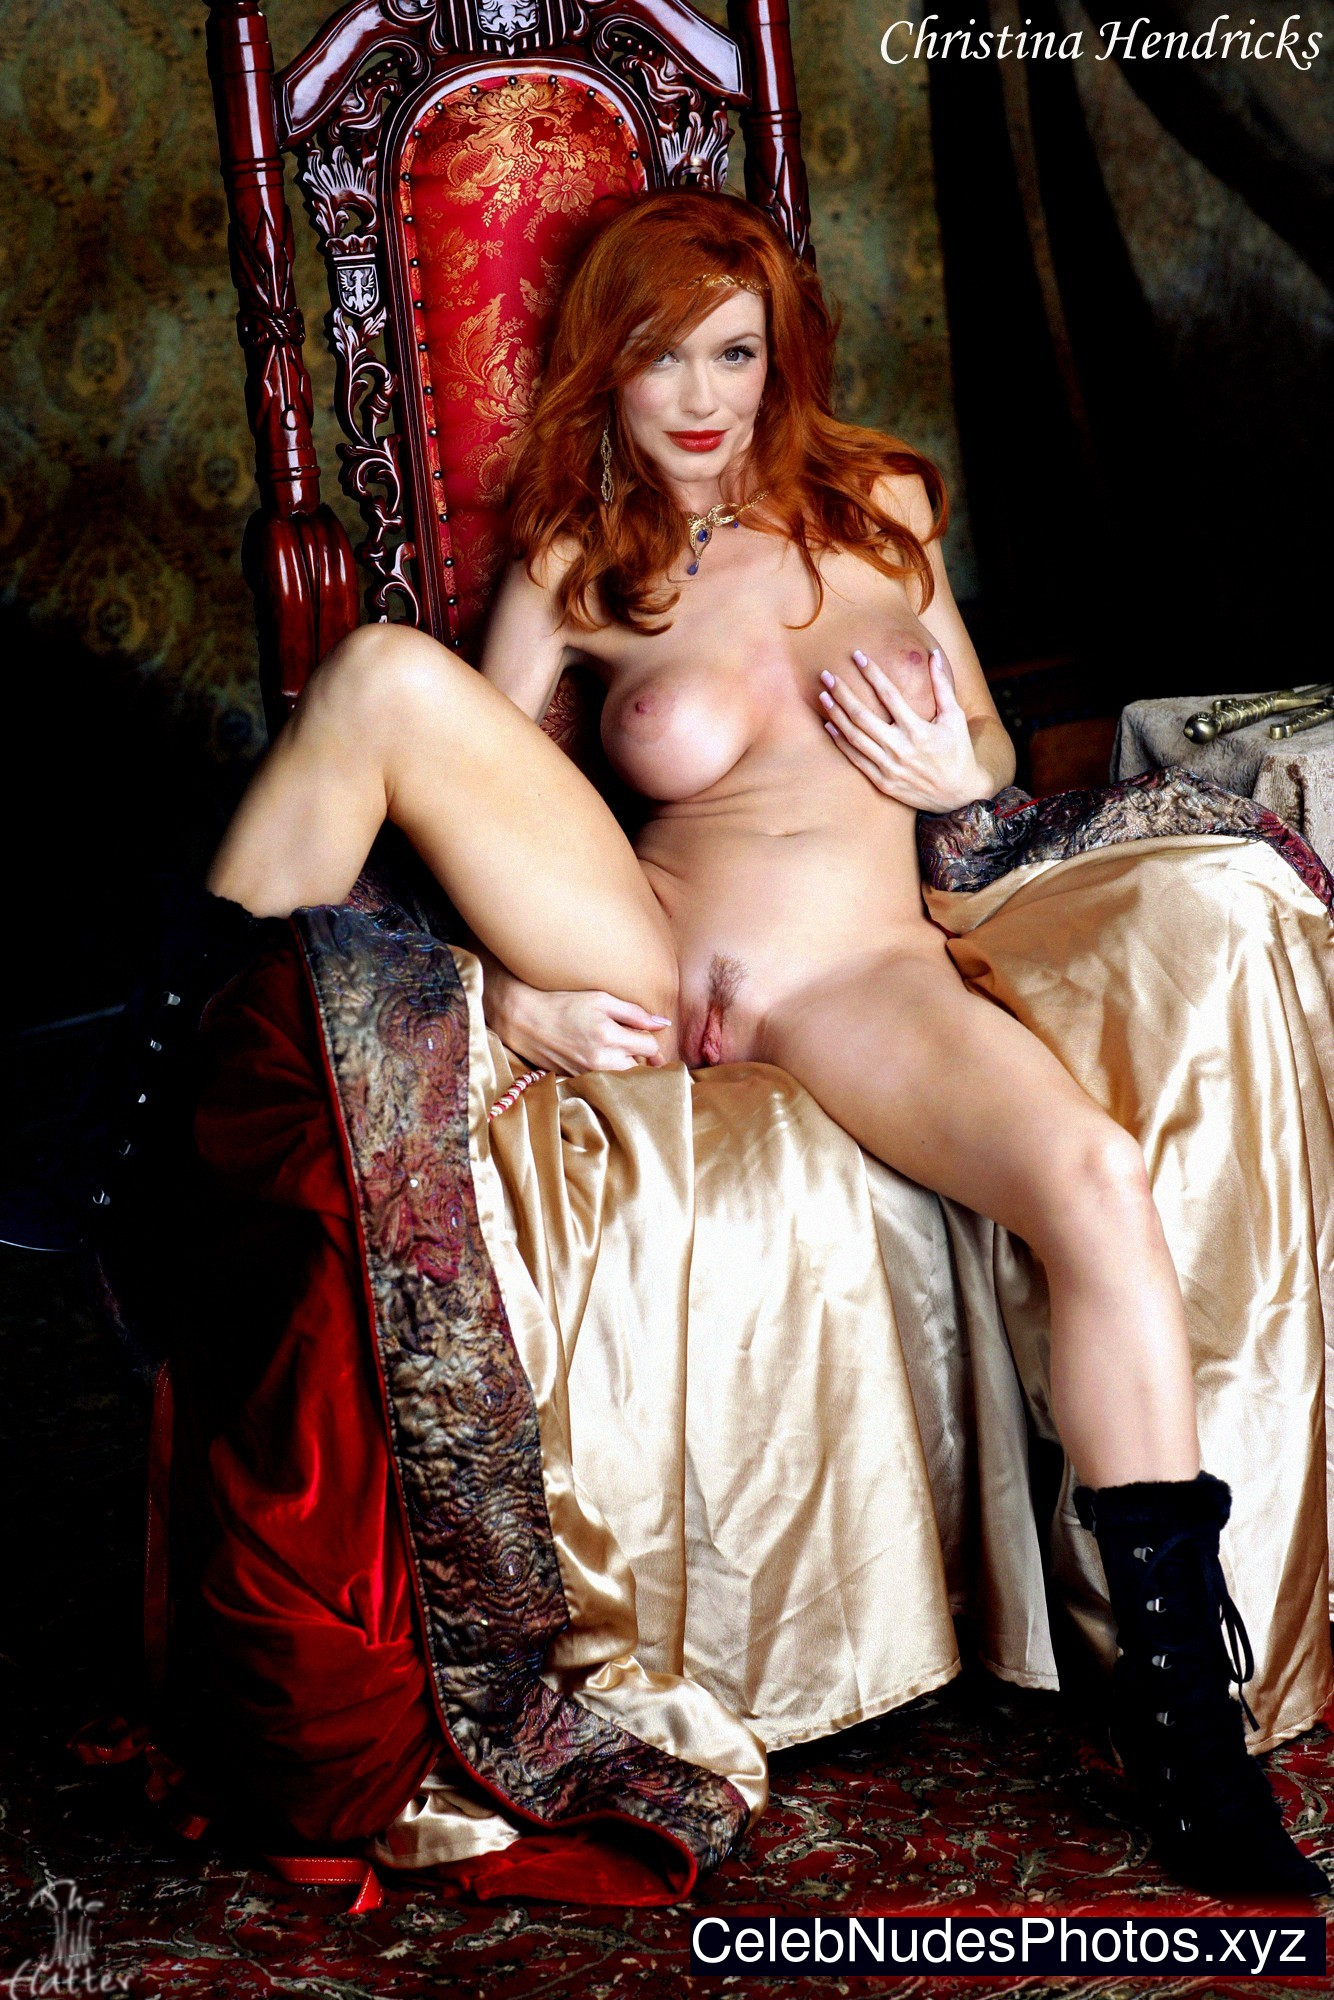 Christina hendricks topless pics